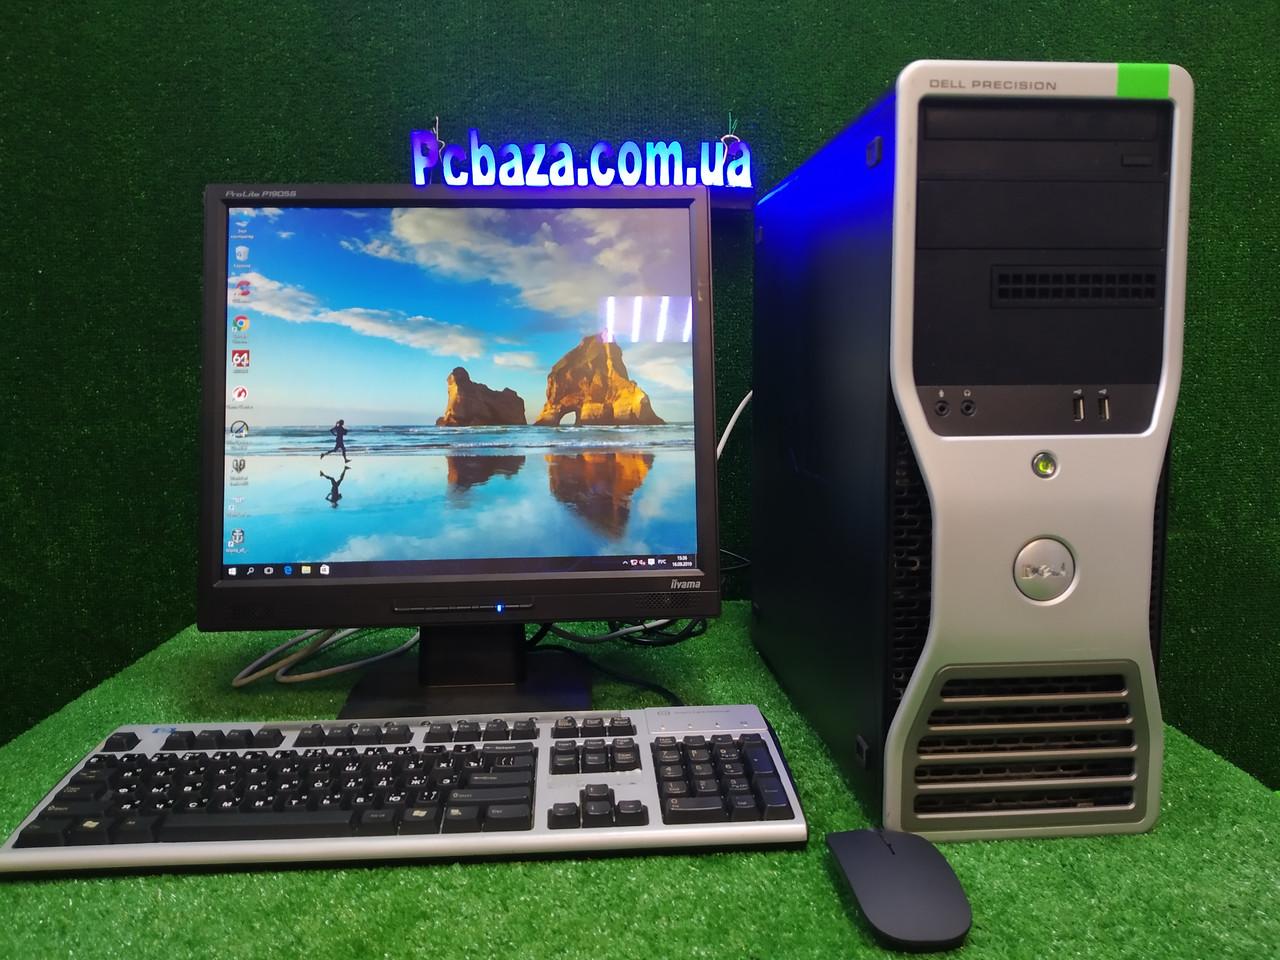 "ПК с защитным монитором 19"" Dell Precision 390 \ Intel 4 ядра, 4 ГБ ОЗУ, 160 Гб HDD"